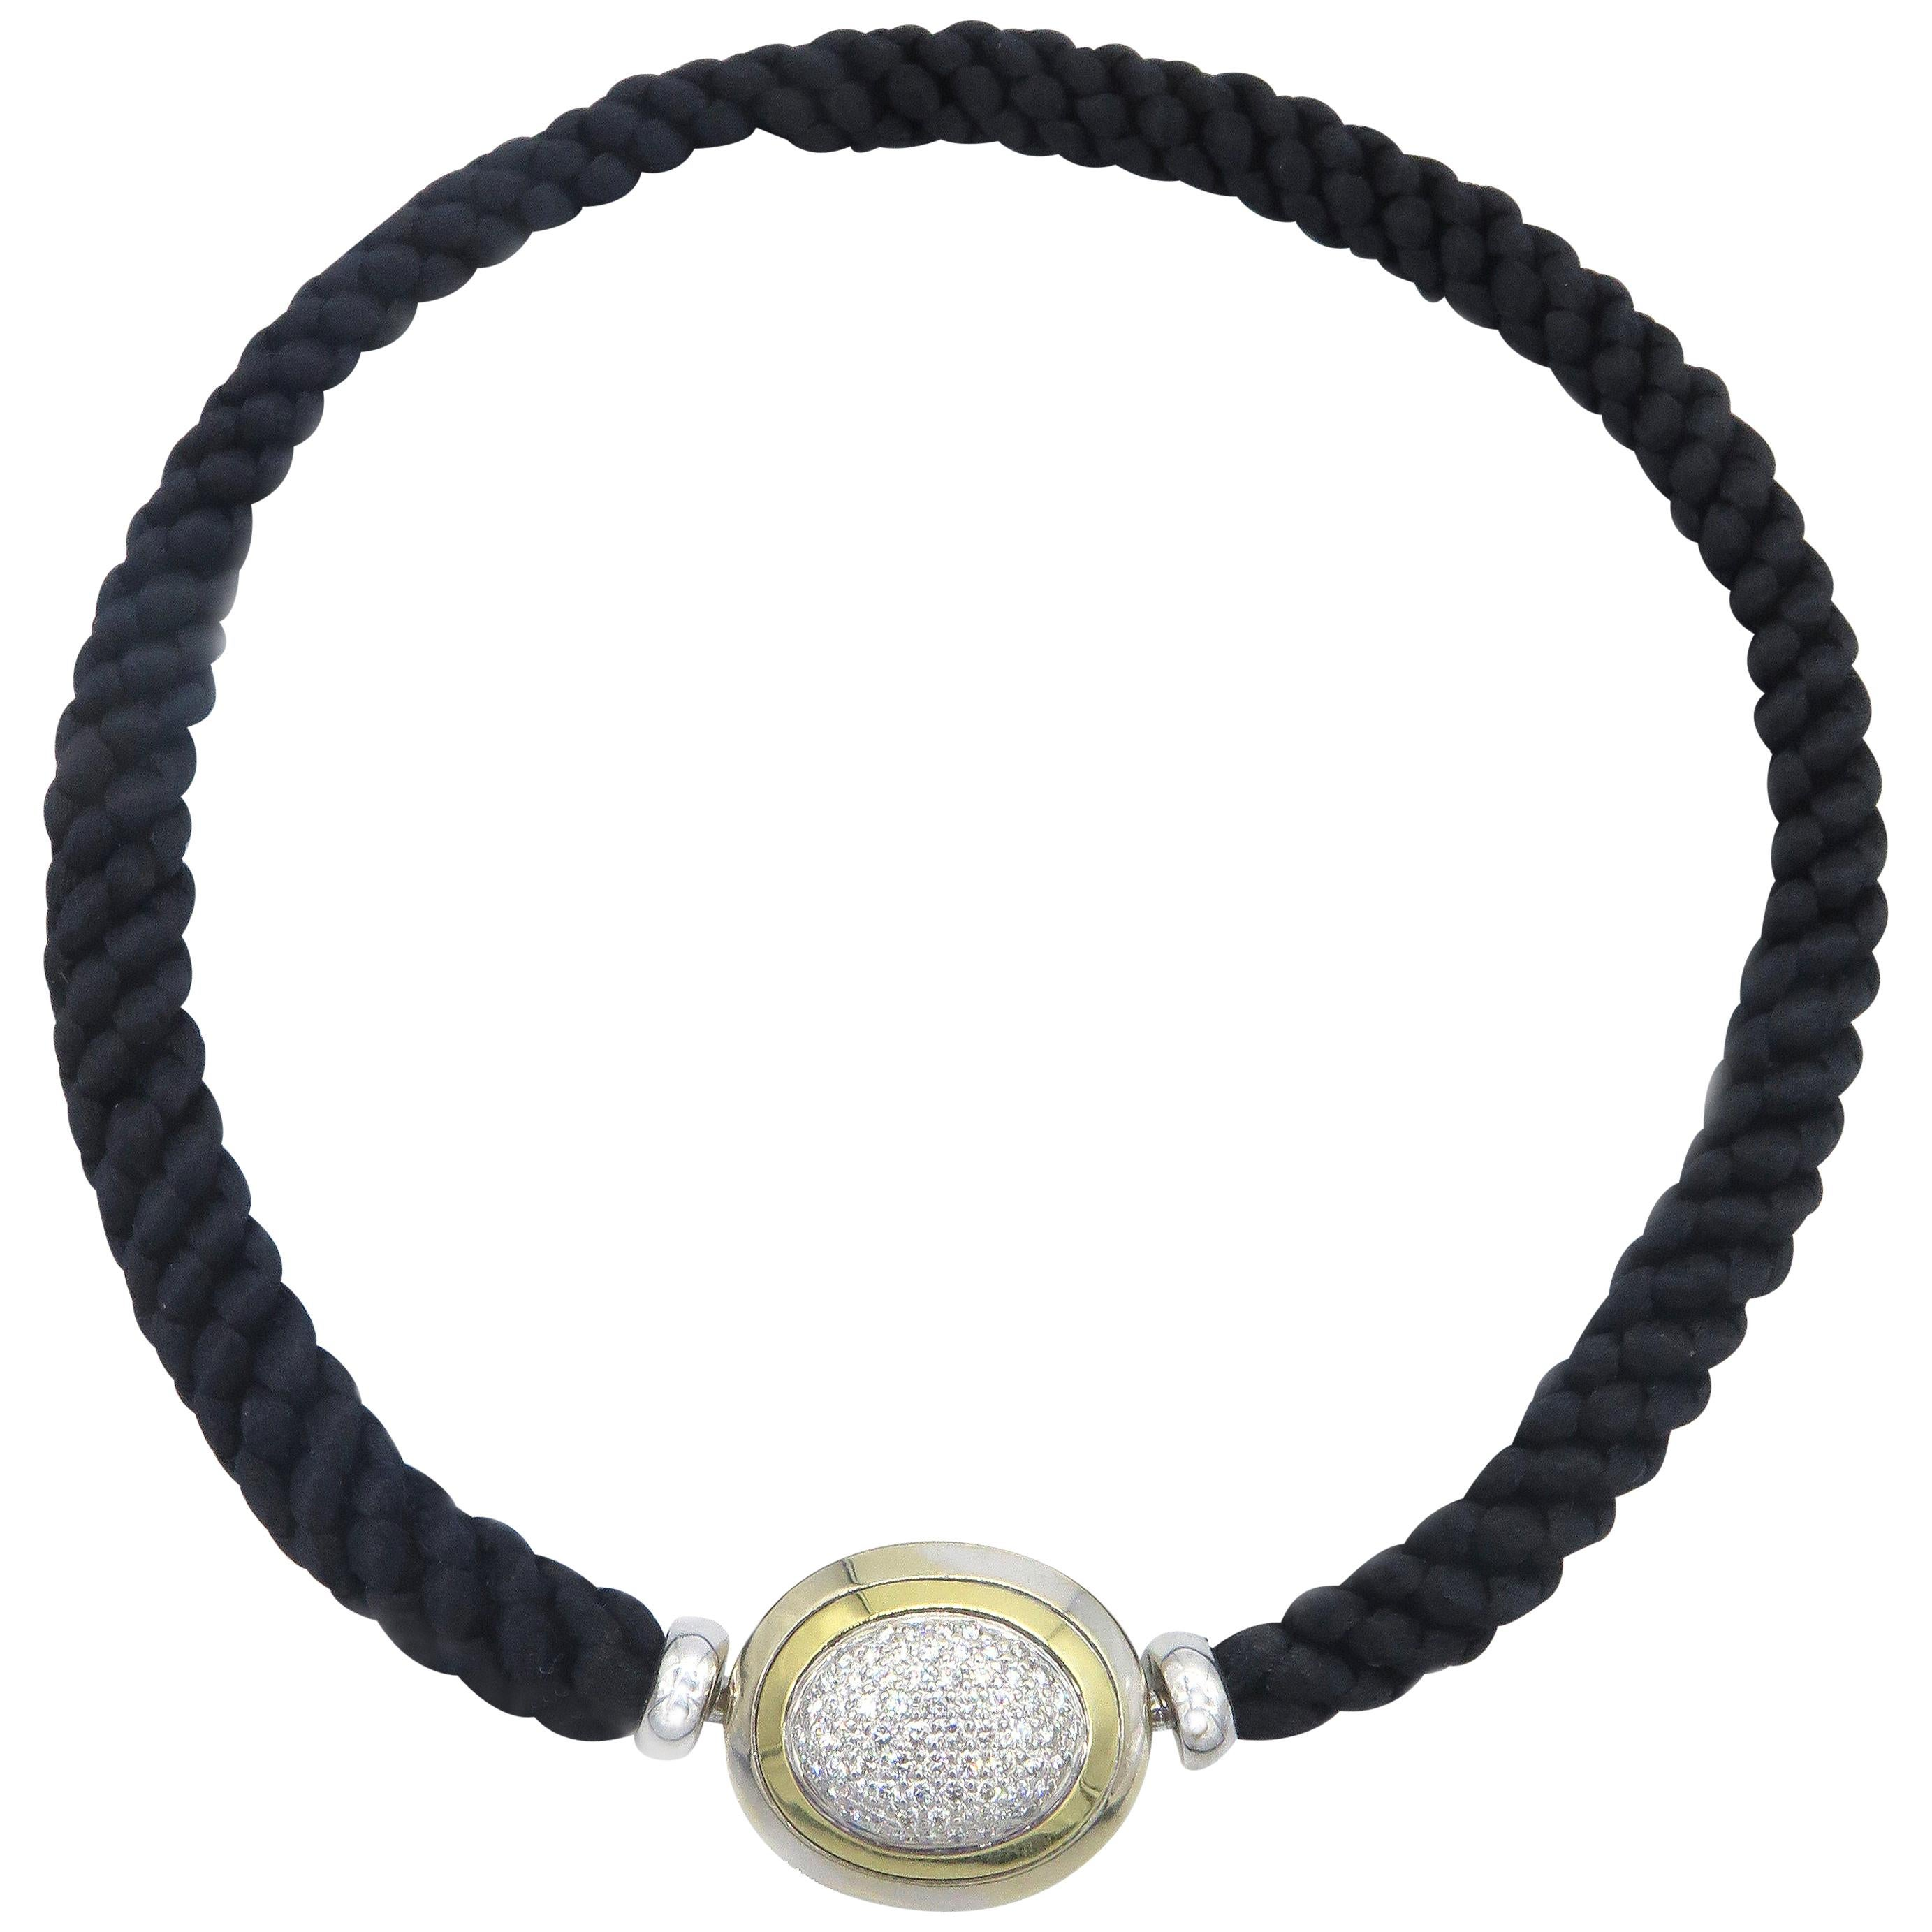 Hammerman Fine Diamond Luxurious Cord Choker Necklace